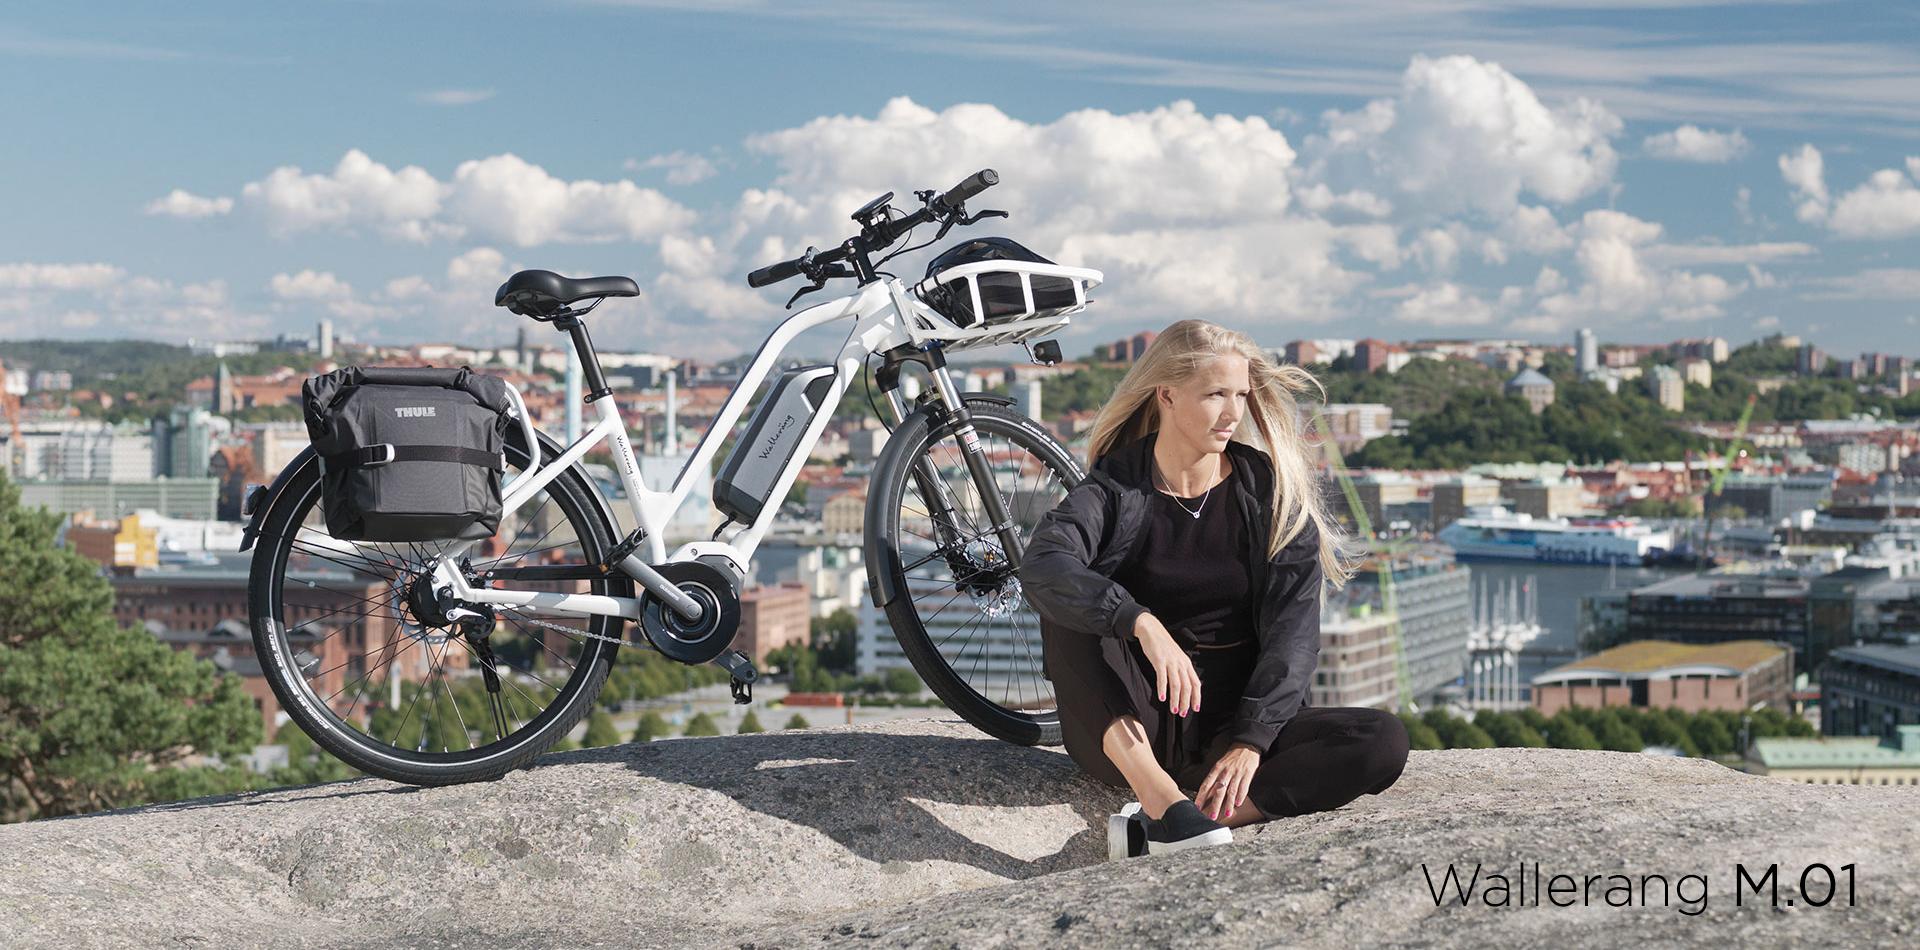 https://electric-bike-store.co.uk/wp-content/uploads/2017/06/Wallerang-M-02X-Therese.jpg